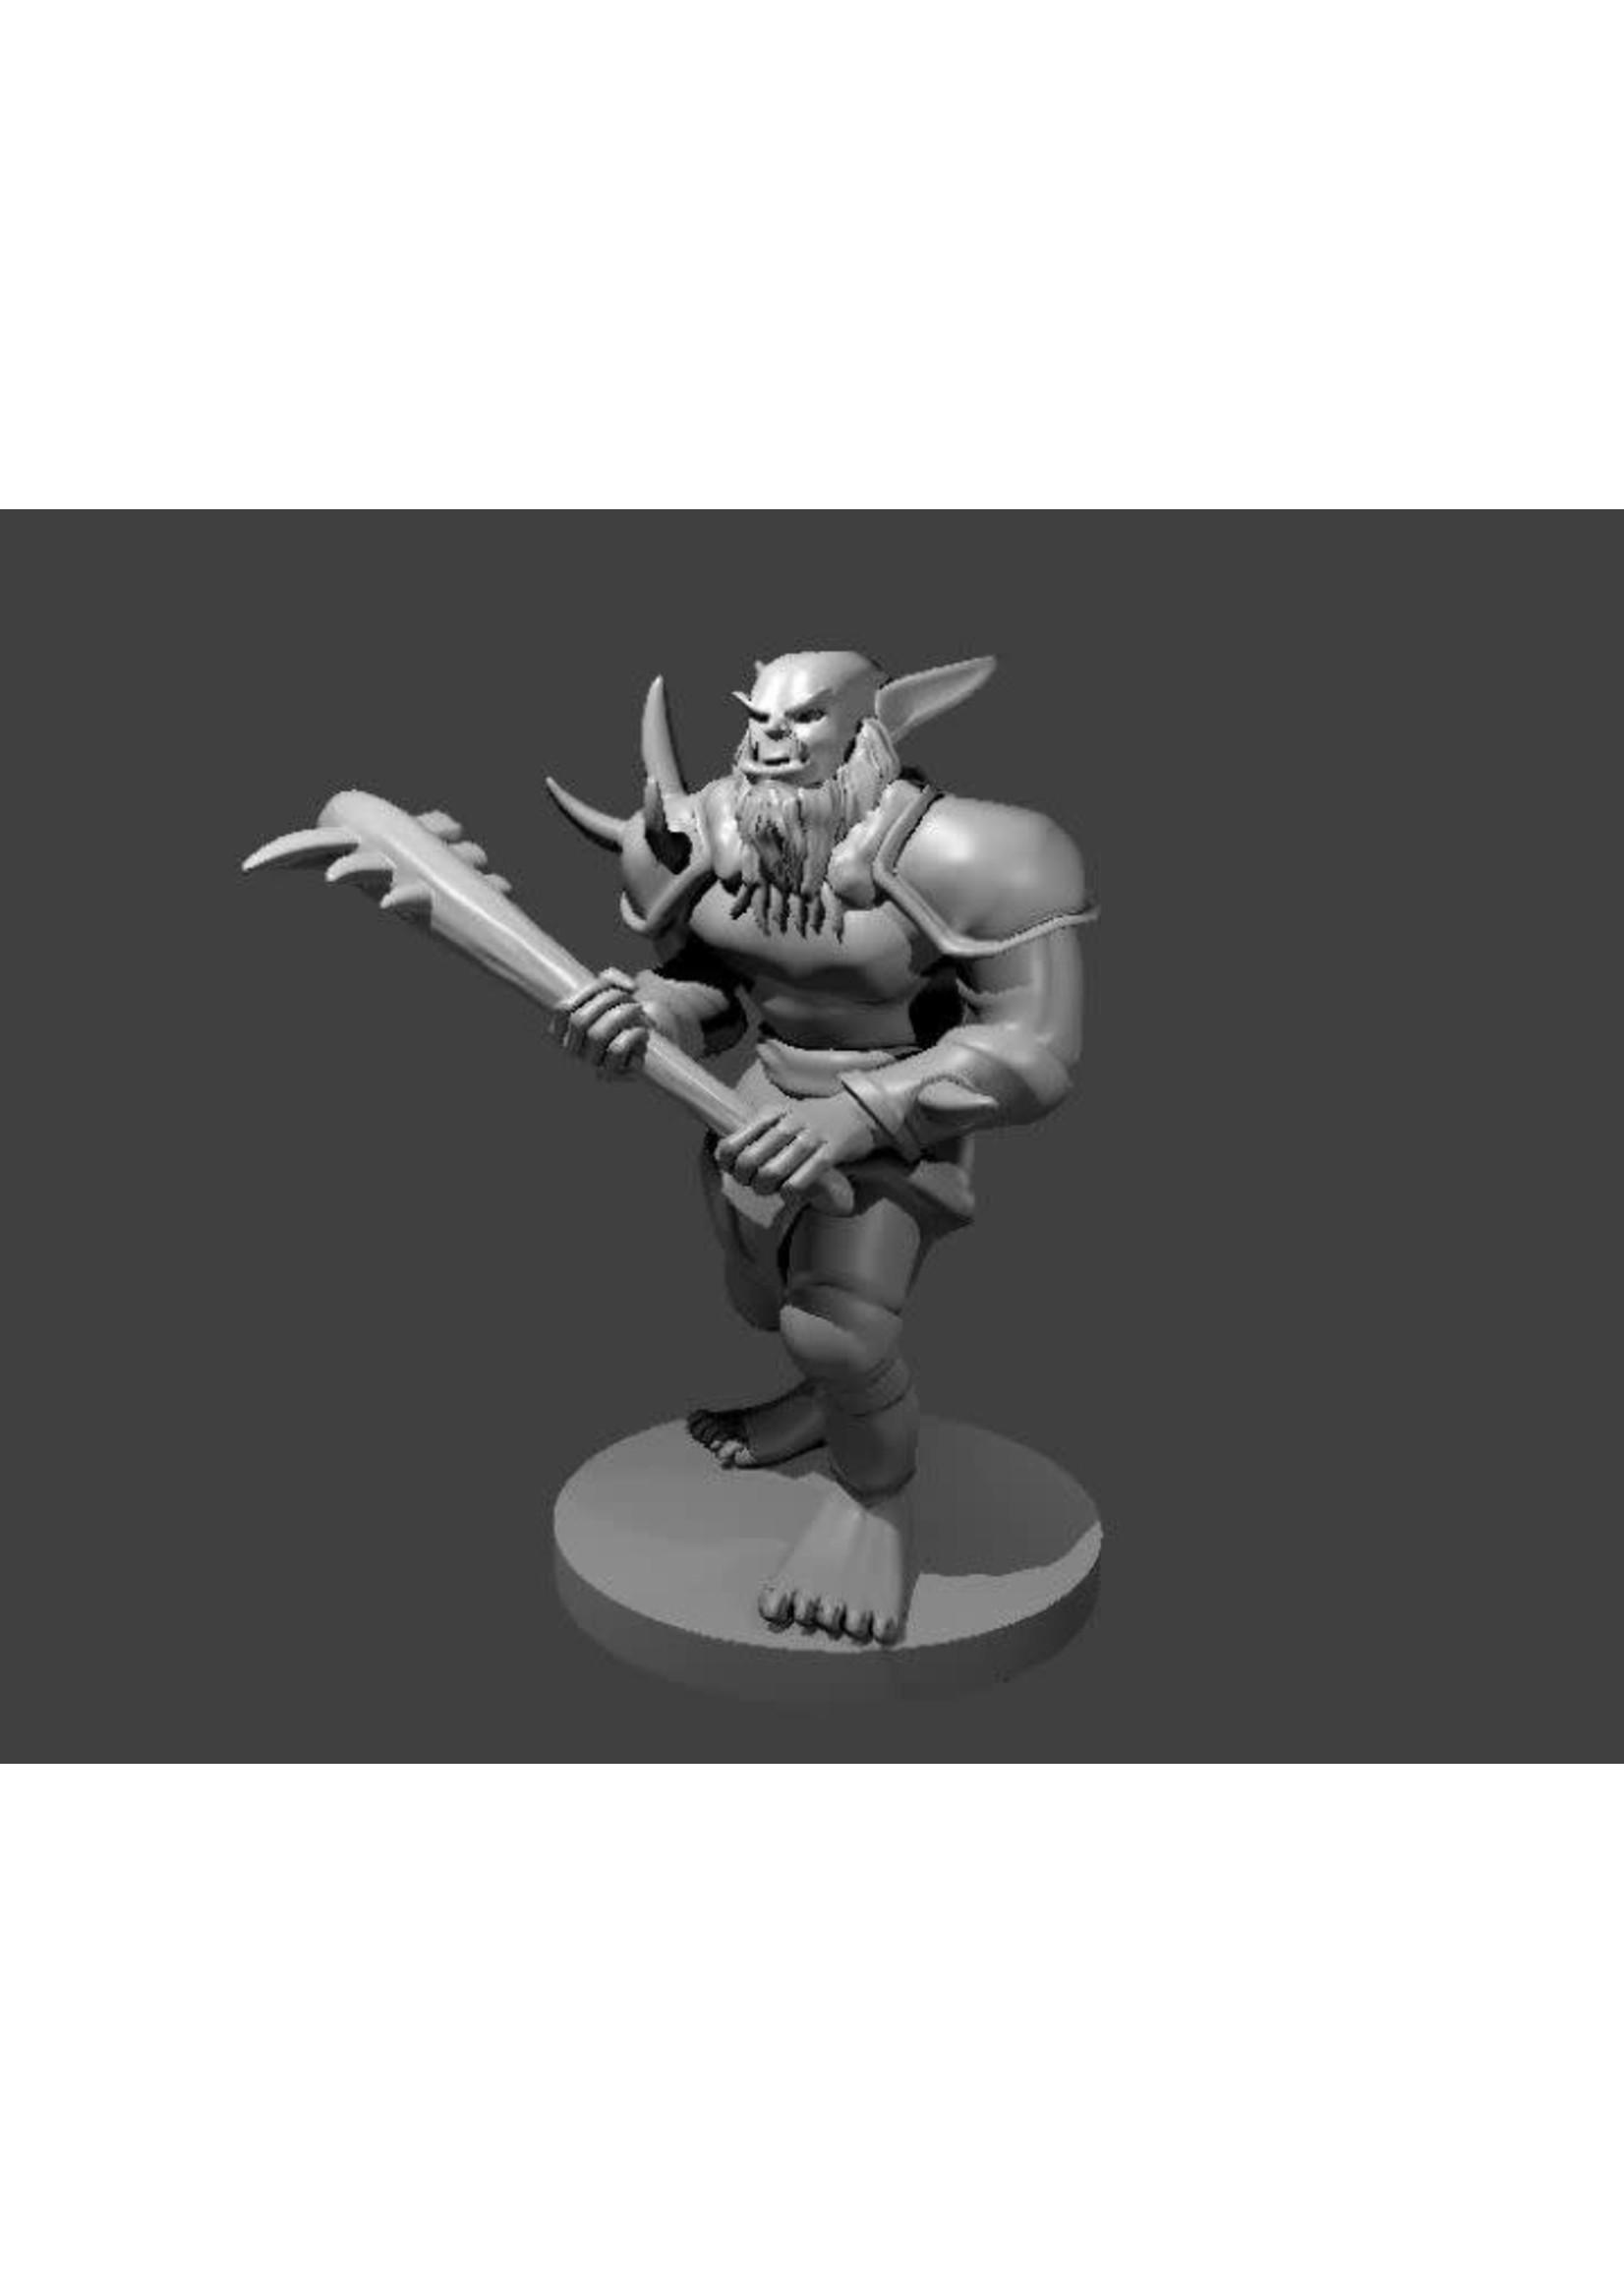 Bugbear With Club (Patreon Mz4250)